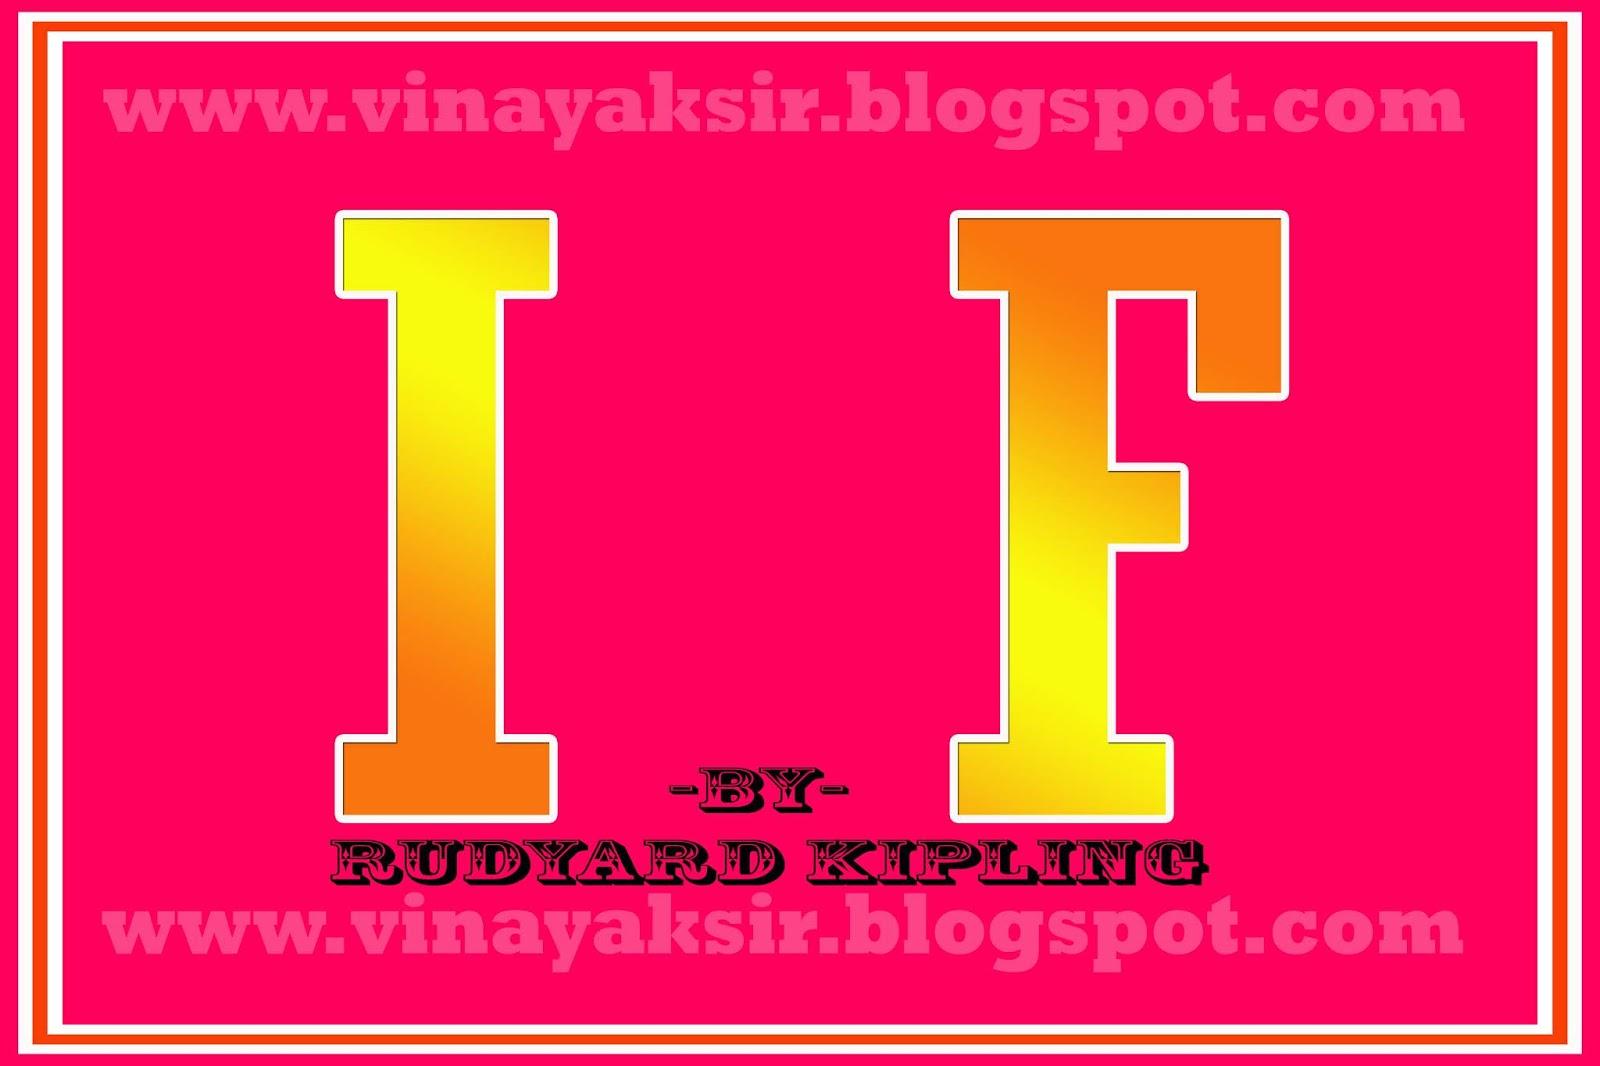 Vinayak Sir 3 1 If Rudyard Kipling Explanation Of The Poem Standard 10th English Summary By Pdf Download